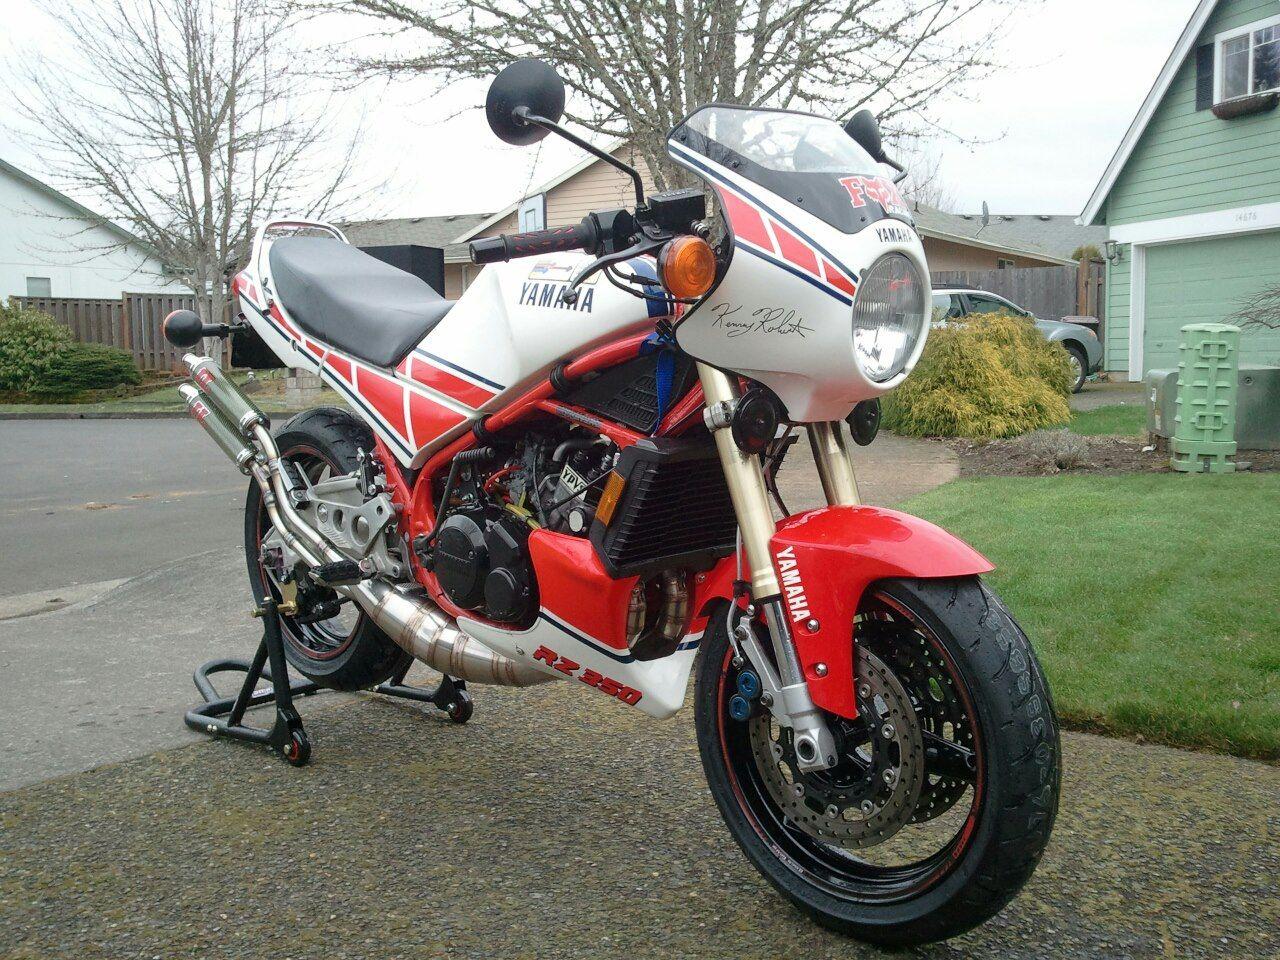 Download wallpaper 2560x1440 yamaha, bike, motorcycle